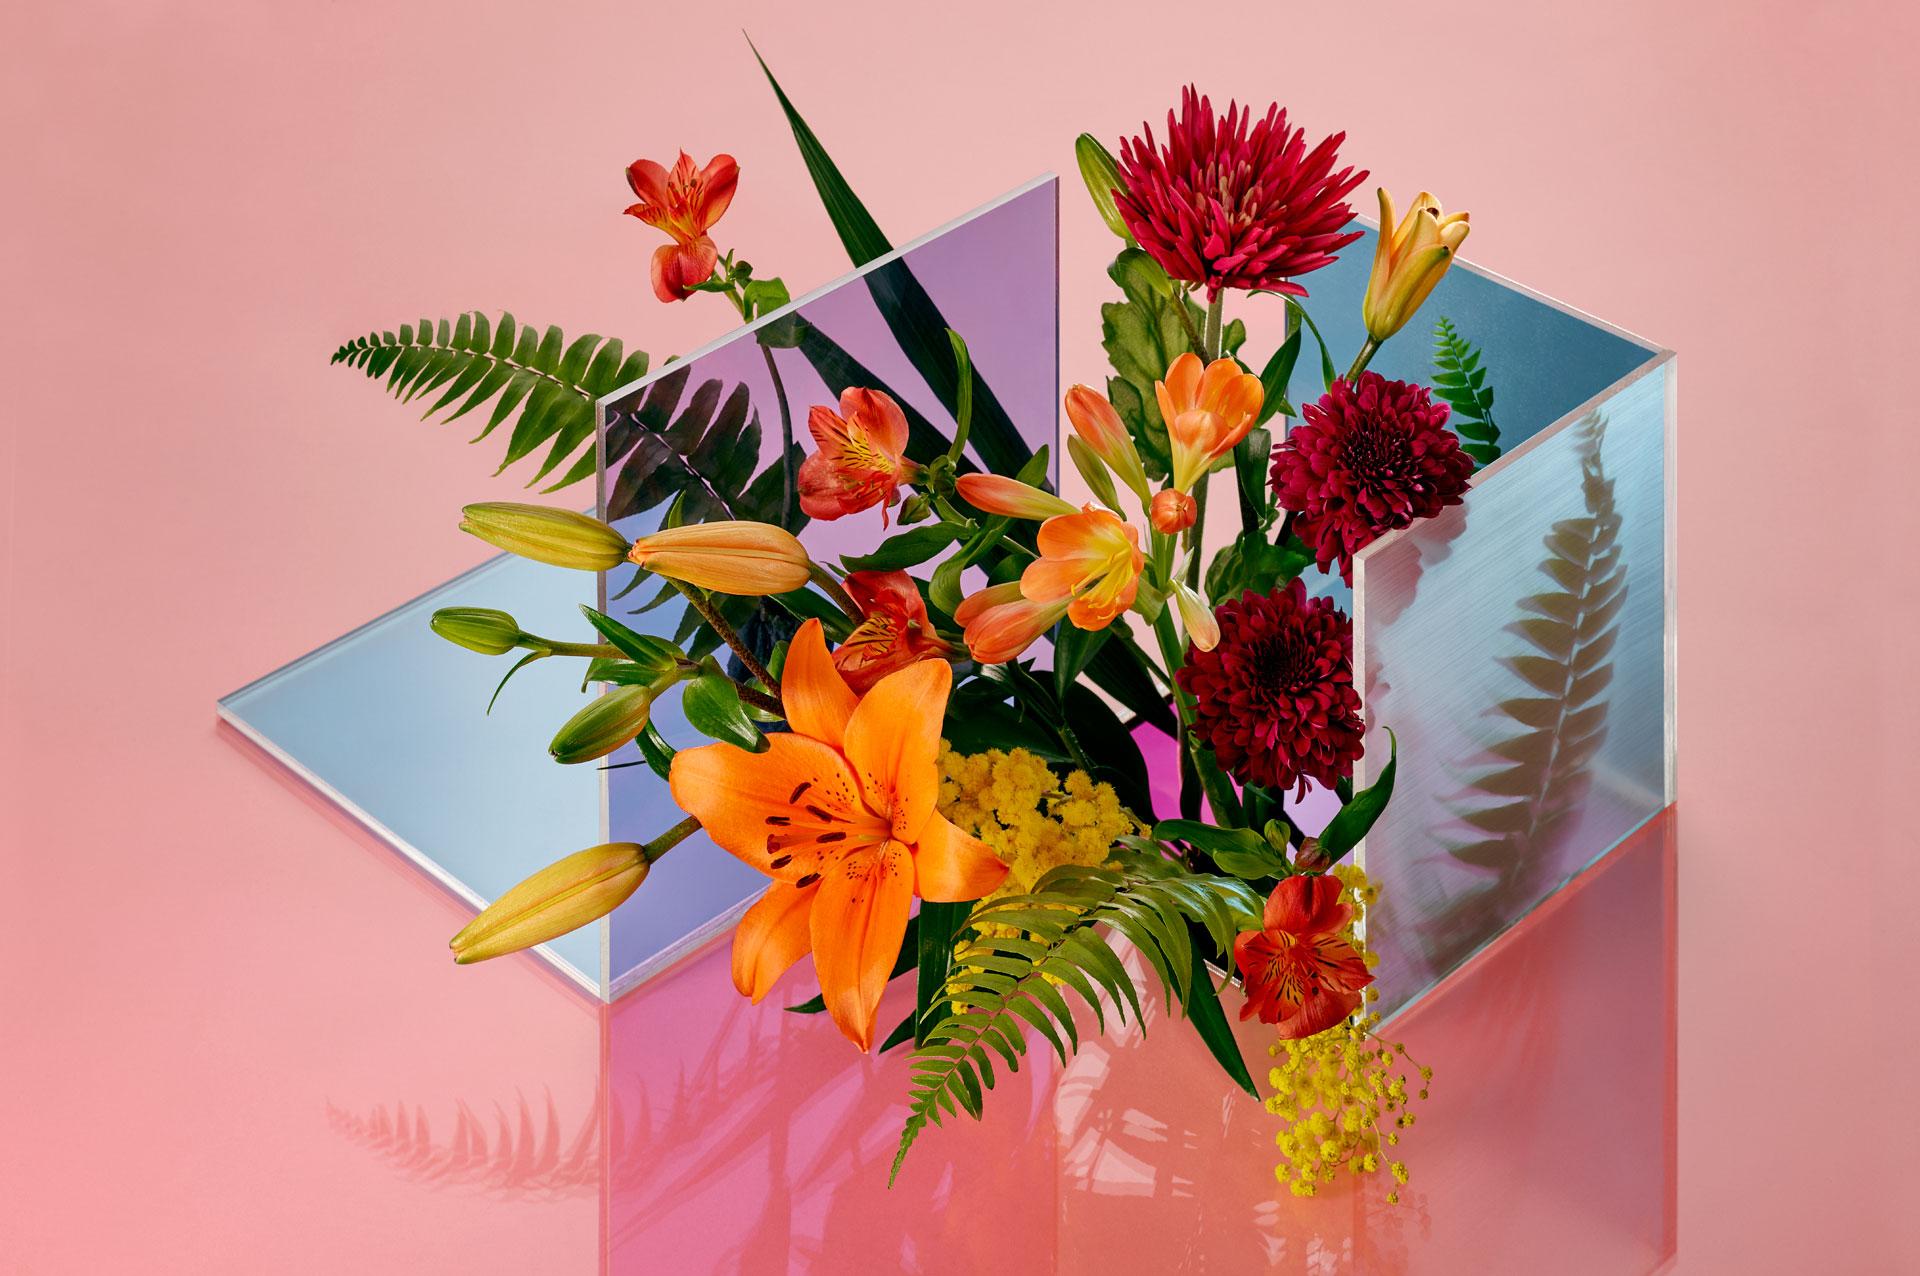 The beauty of flowers plexiglass trendland design art the beauty of flowers plexiglass izmirmasajfo